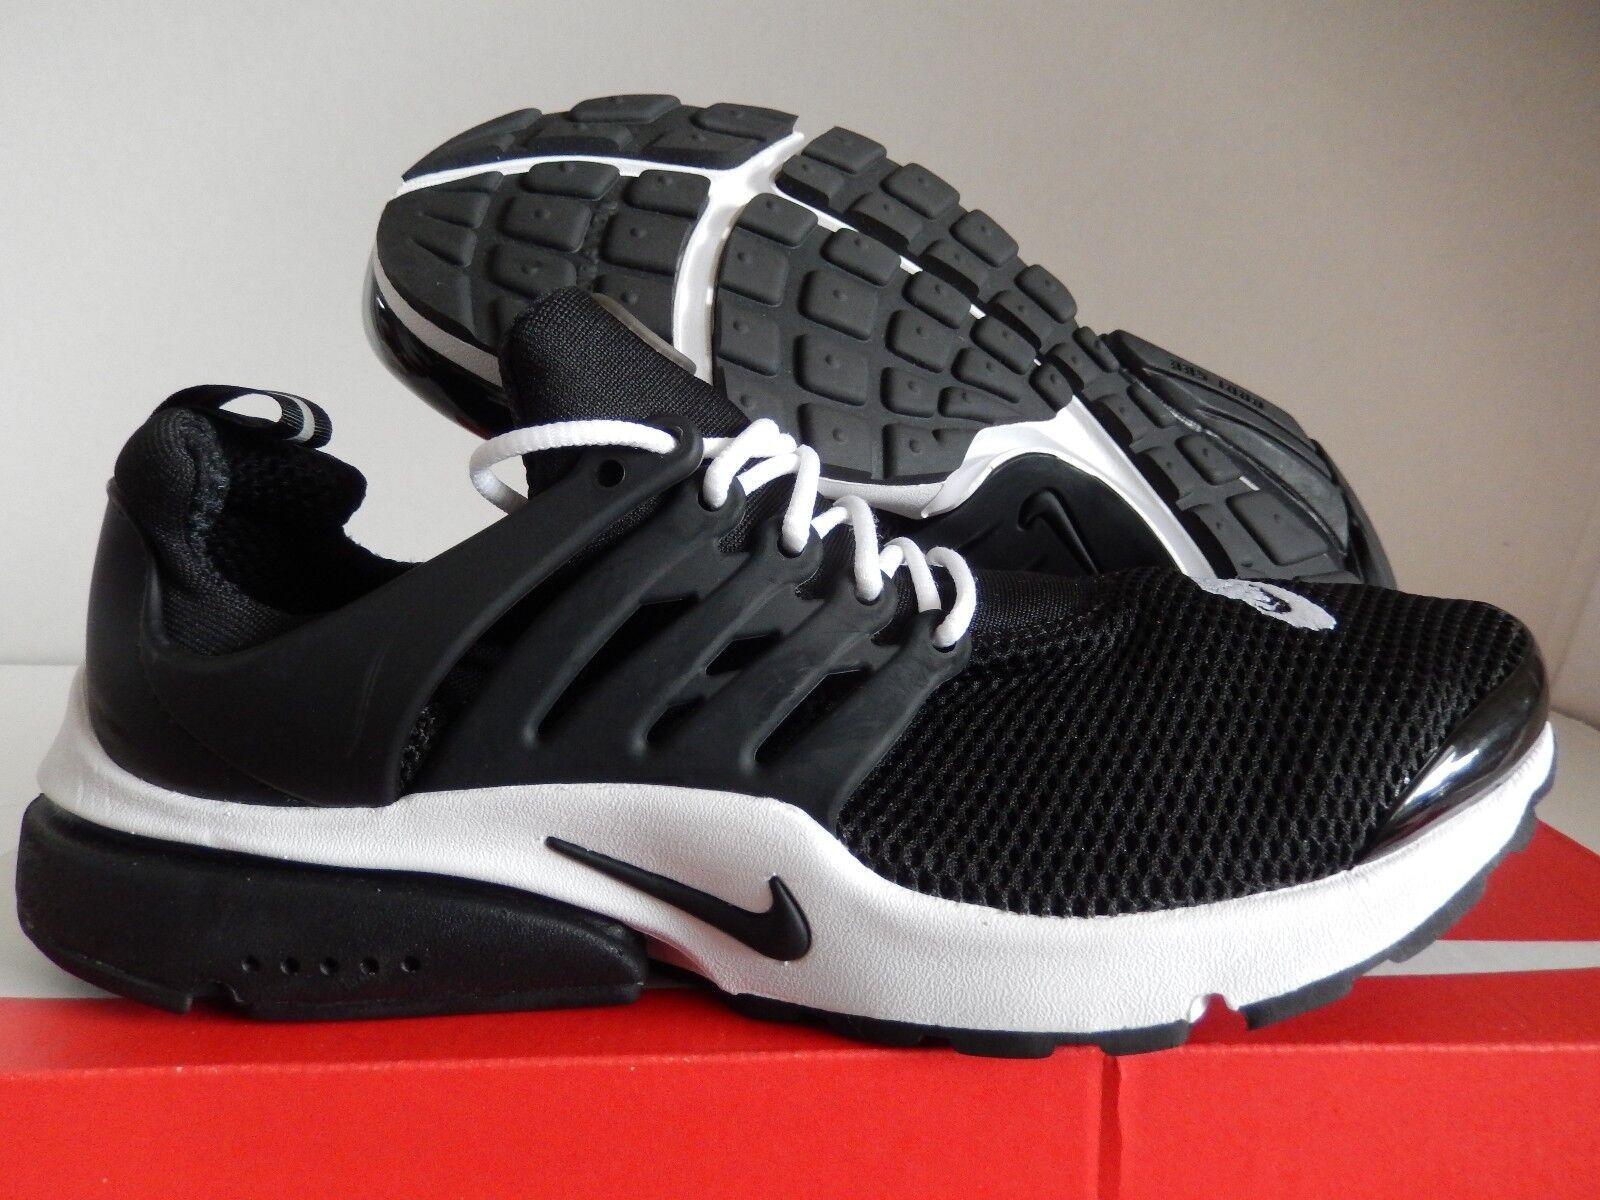 MENS NIKE AIR PRESTO ID BLACK-WHITE Price reduction Wild casual shoes